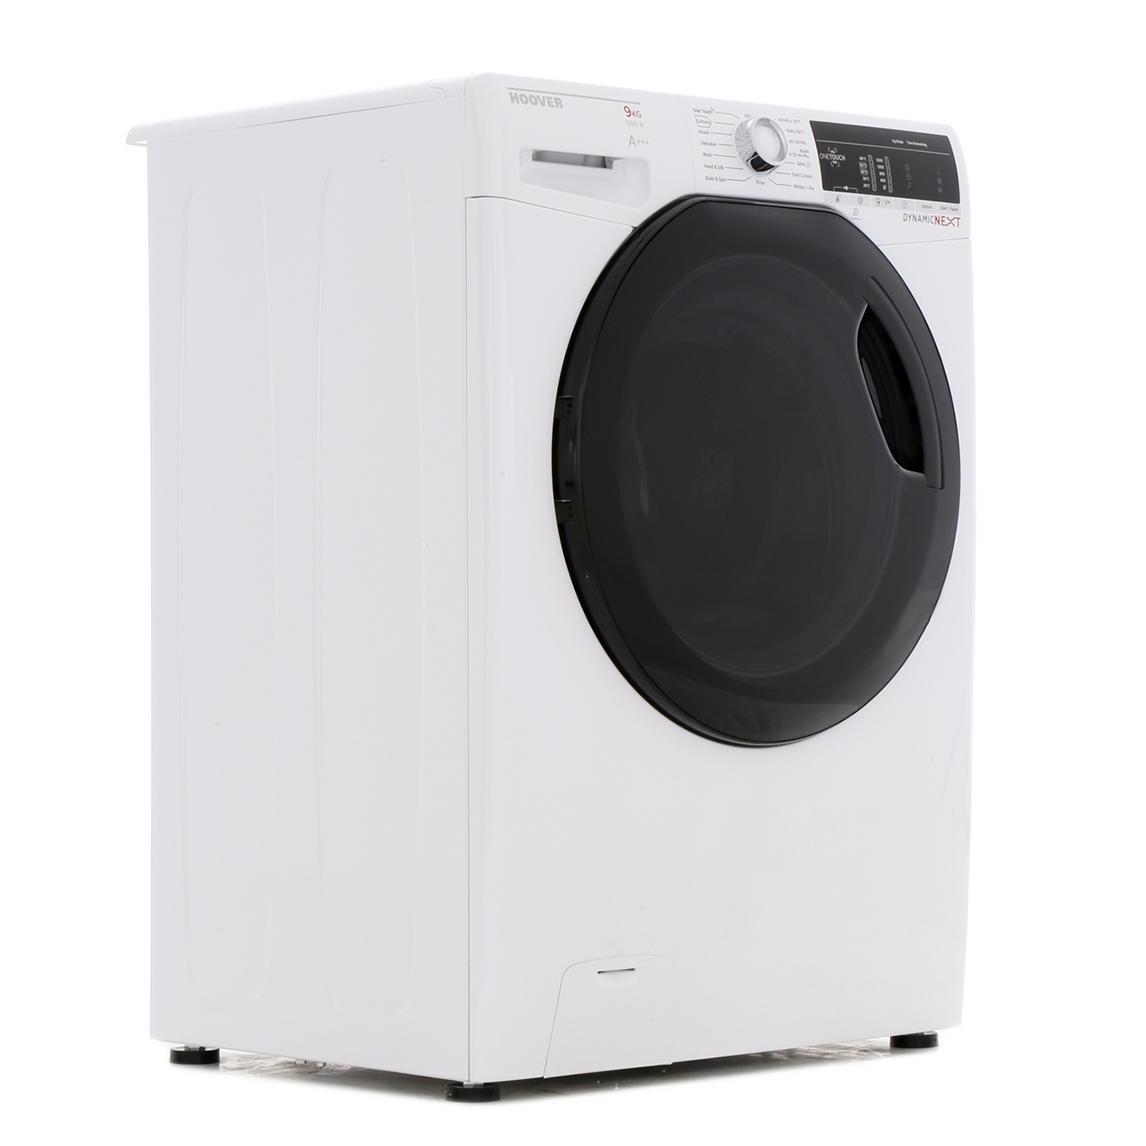 Hoover DXOA59C3 Washing Machine